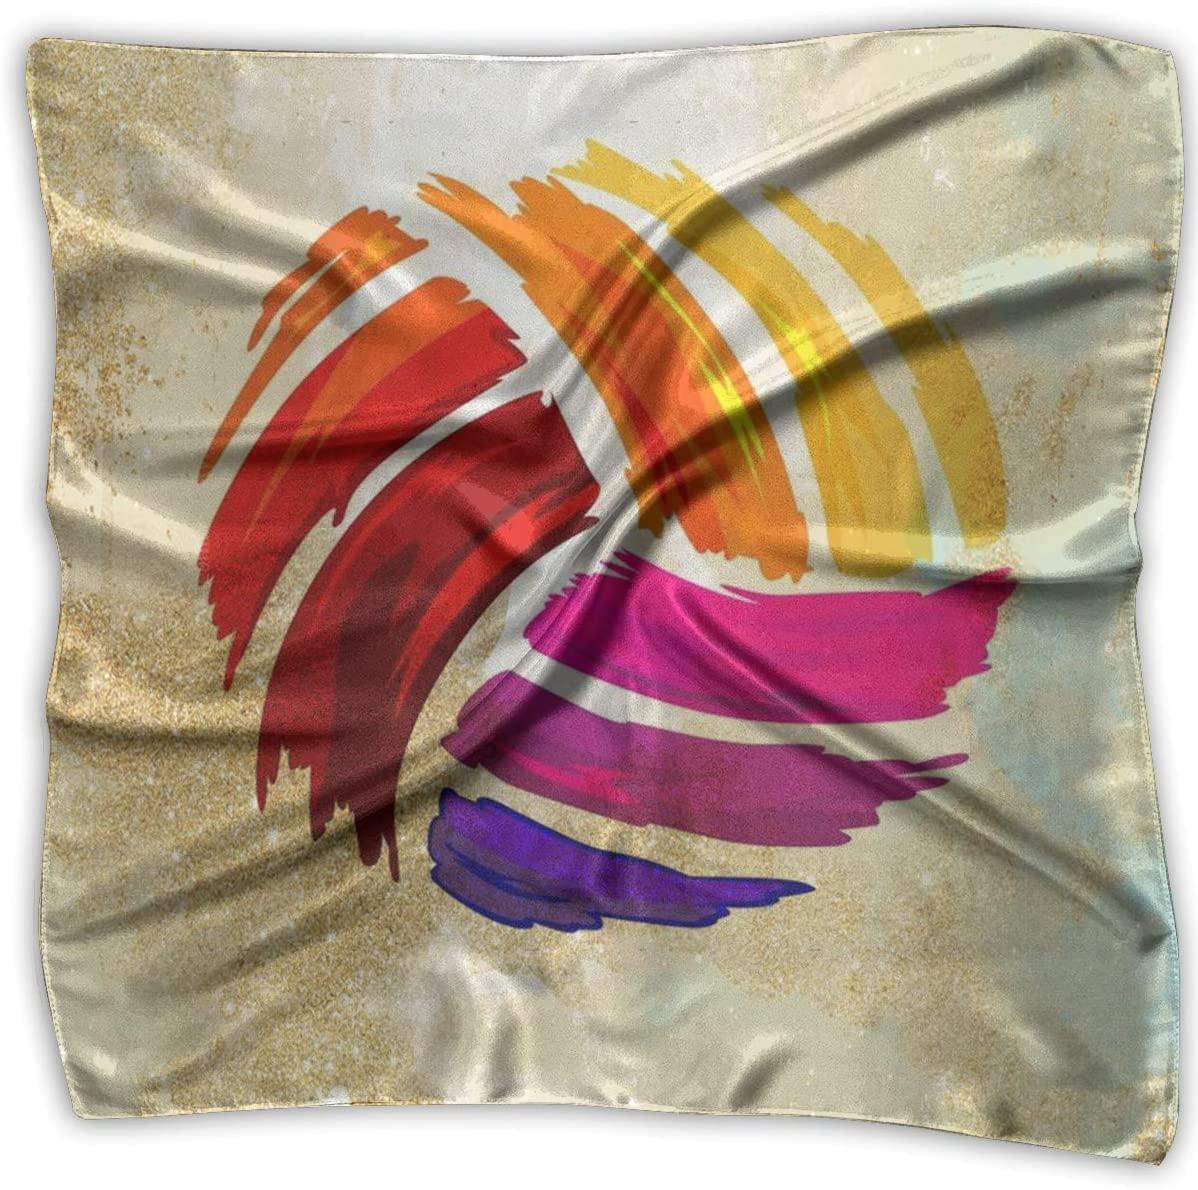 WFIRE Colorful Volleyball Square Handkerchiefs Scarf Shawl Bandanas Headscarf Neckerchief Tie Hair Scarf